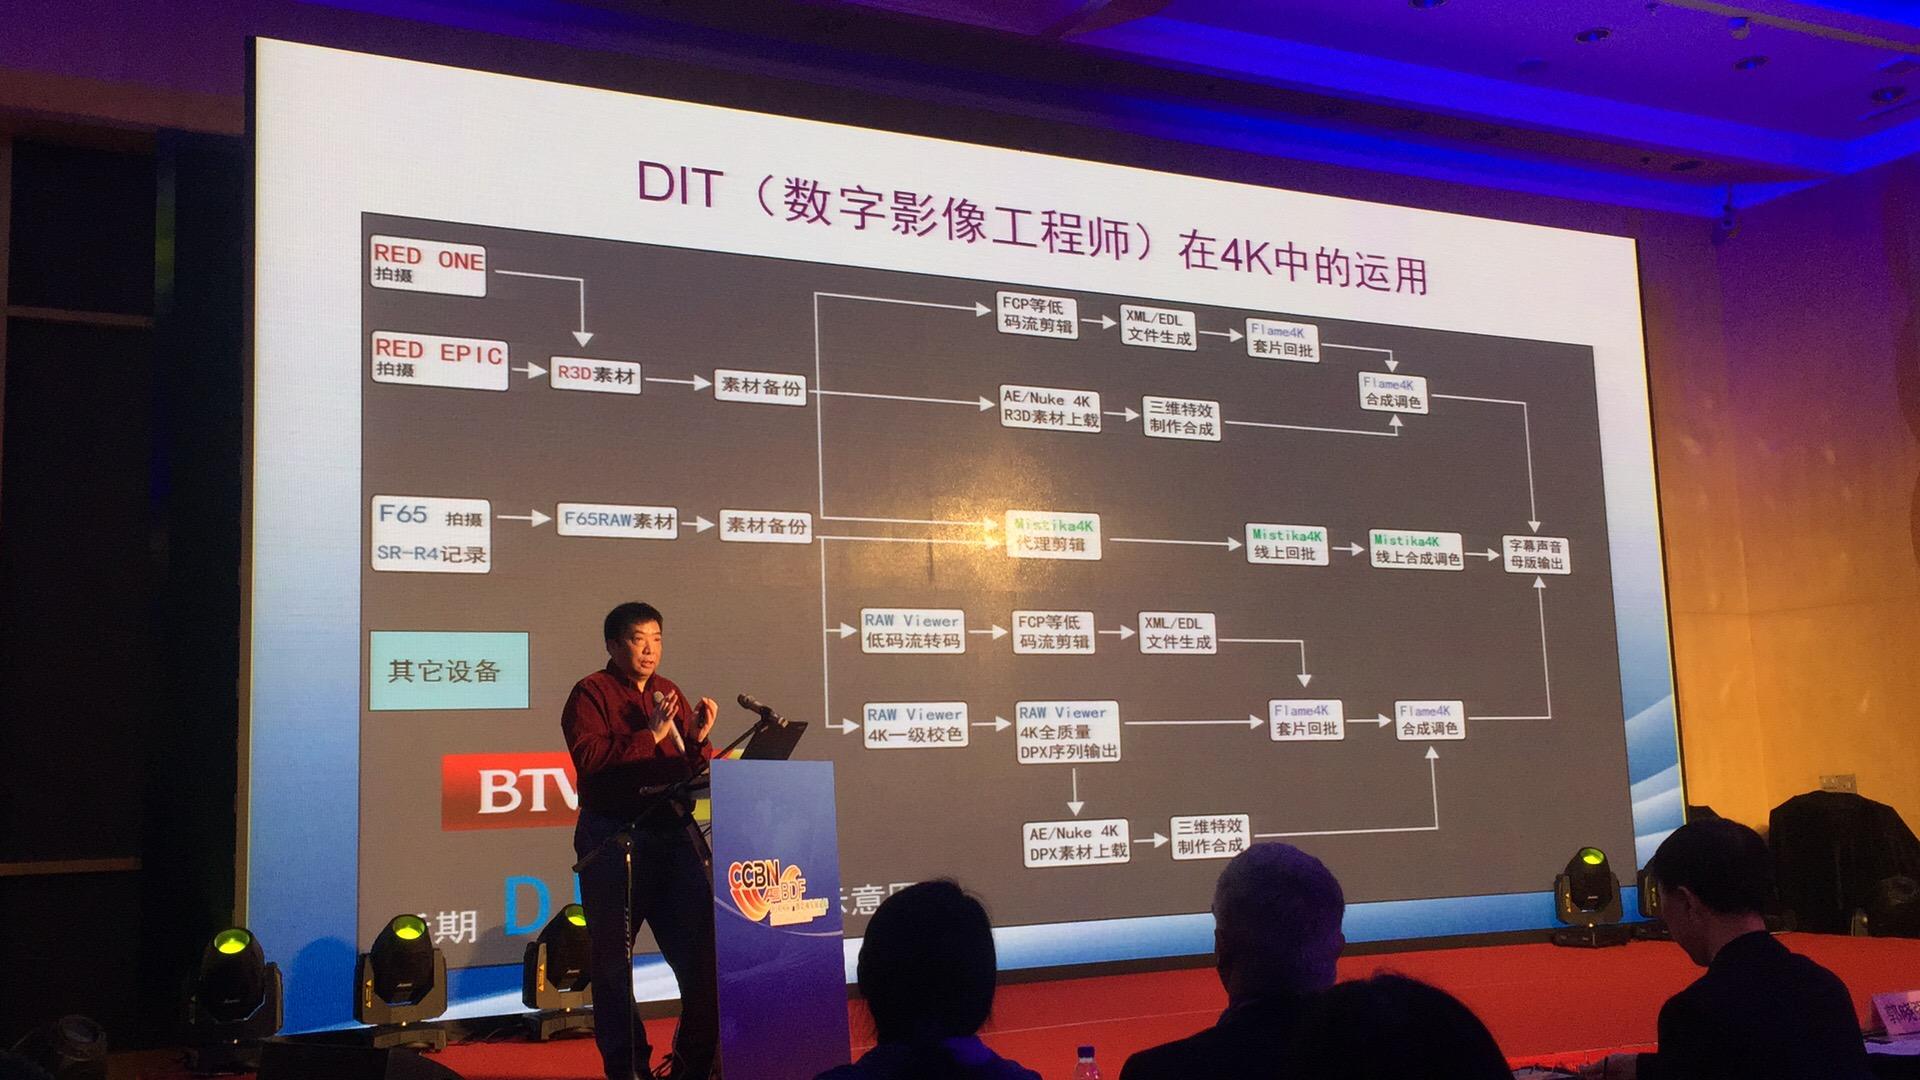 【CCBN】北京电视台技术发展与规划高级工程师<font color=